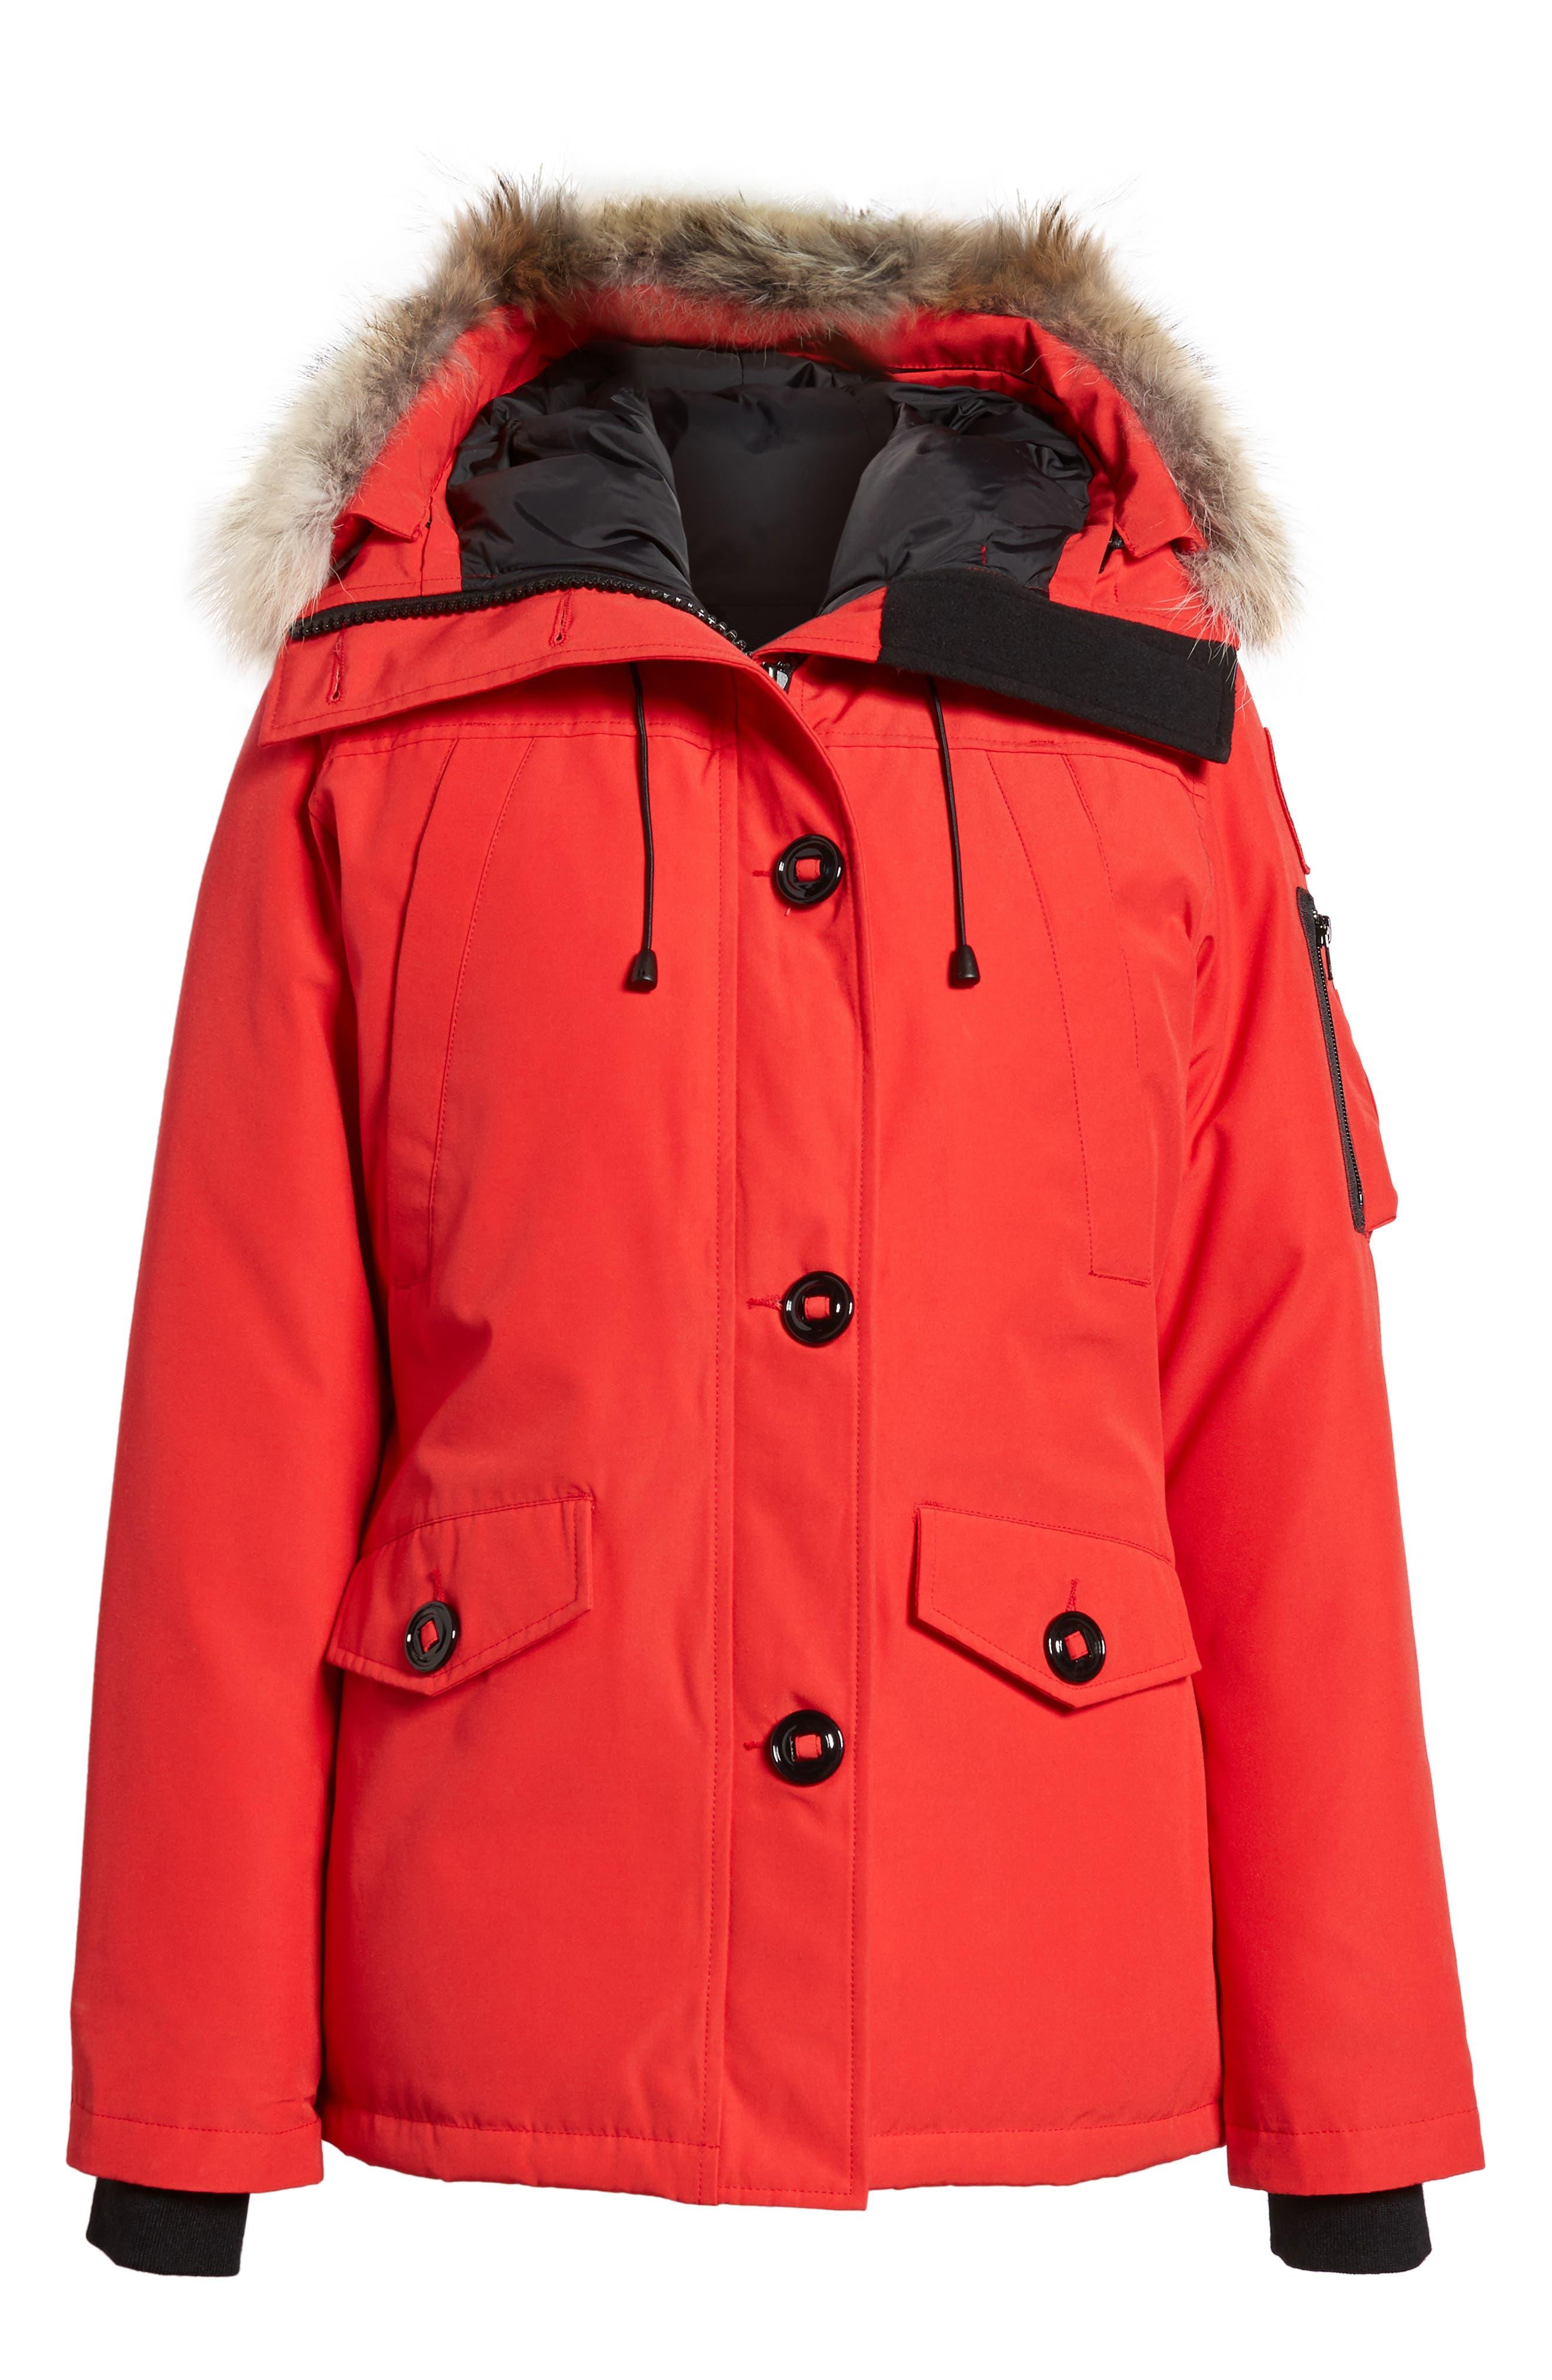 Alternate Image 1 Selected - Canada Goose Montebello Slim Fit Down Parka with Genuine Coyote Fur Trim